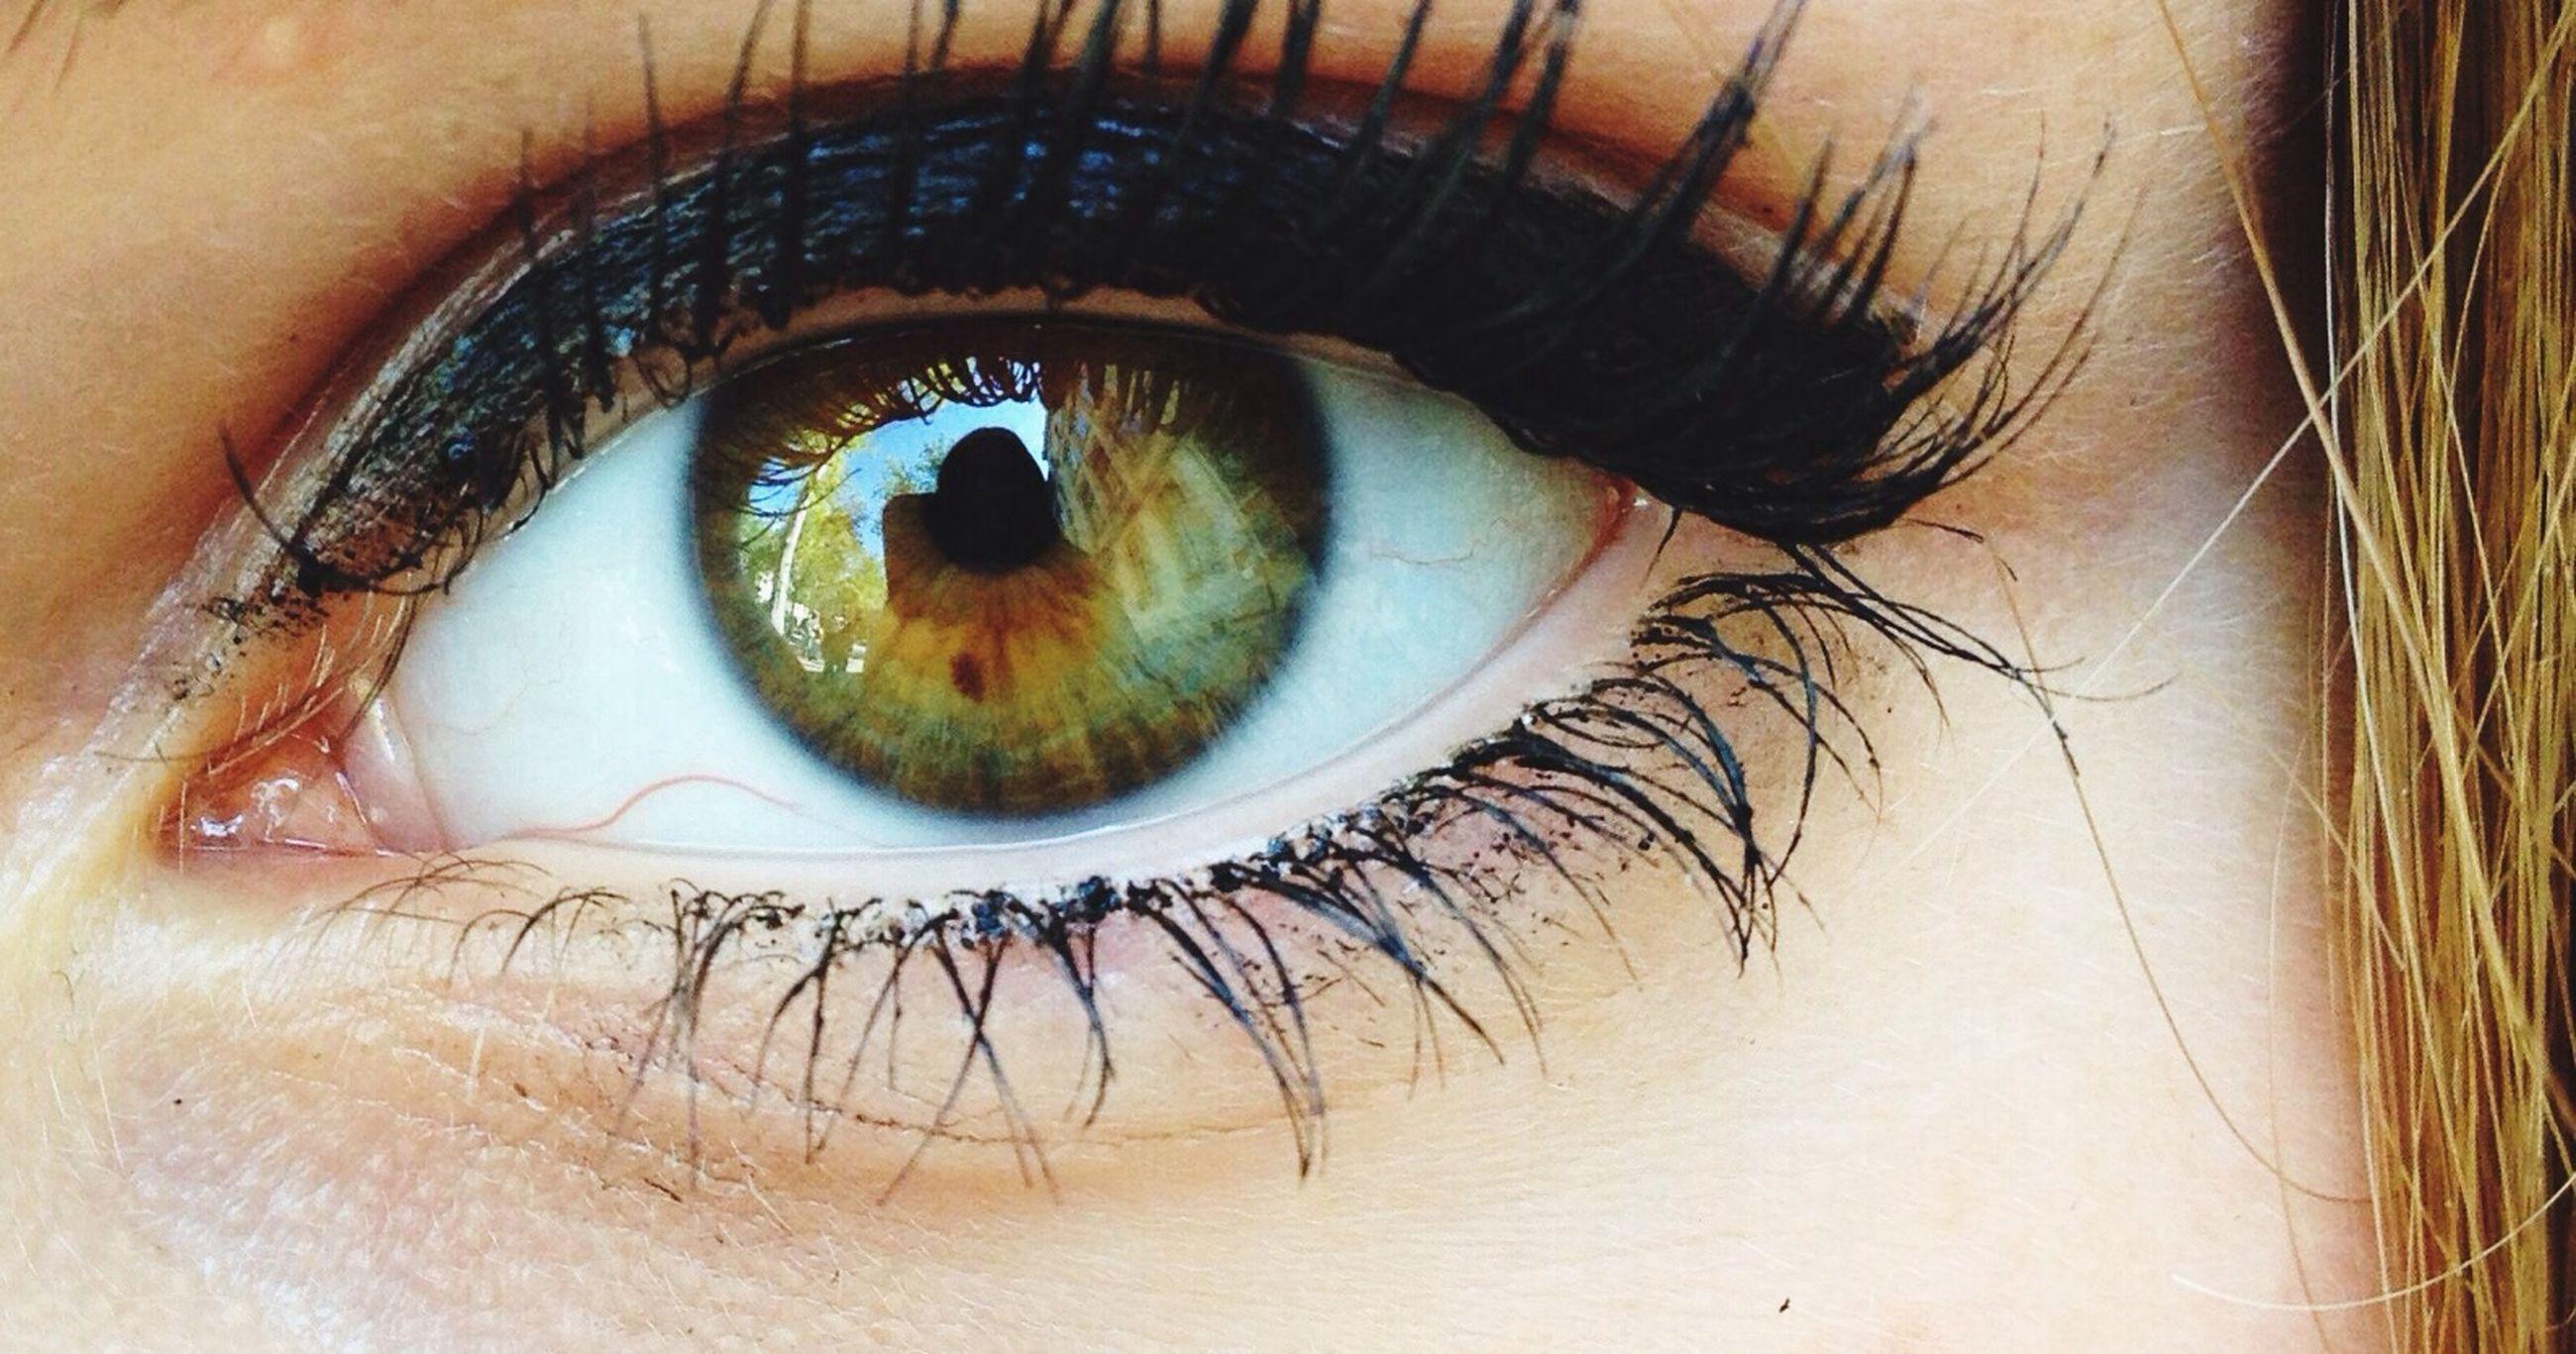 human eye, close-up, eyelash, lifestyles, indoors, eyesight, looking at camera, part of, portrait, human skin, sensory perception, unrecognizable person, person, human face, leisure activity, eyeball, extreme close-up